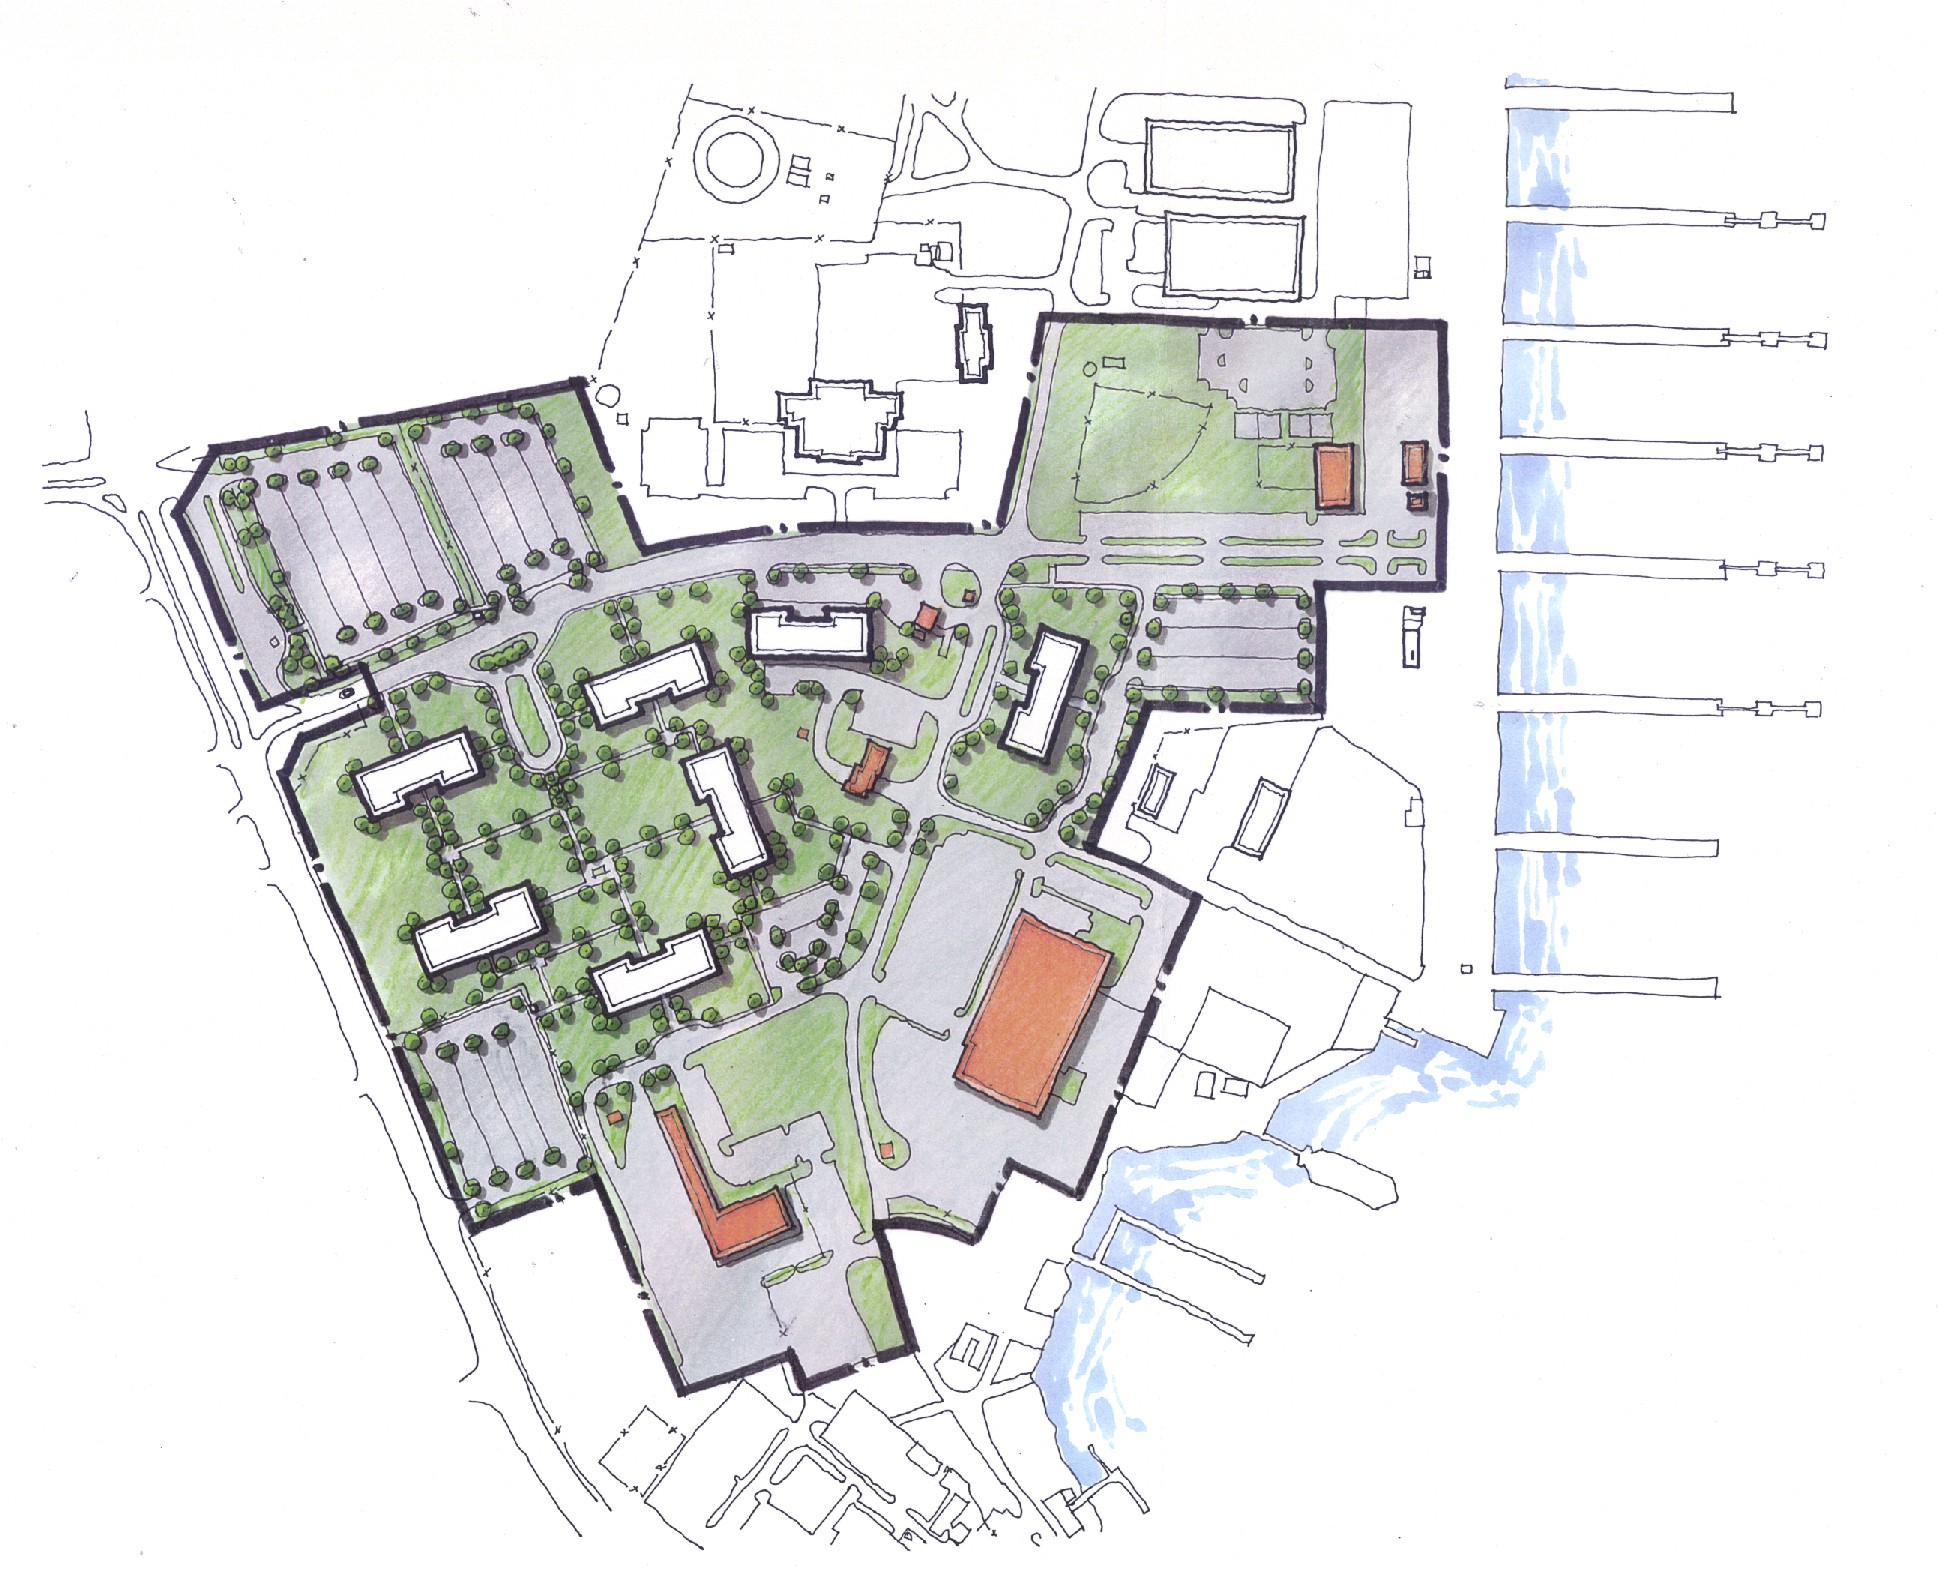 Little Creek Naval Base Master Plan